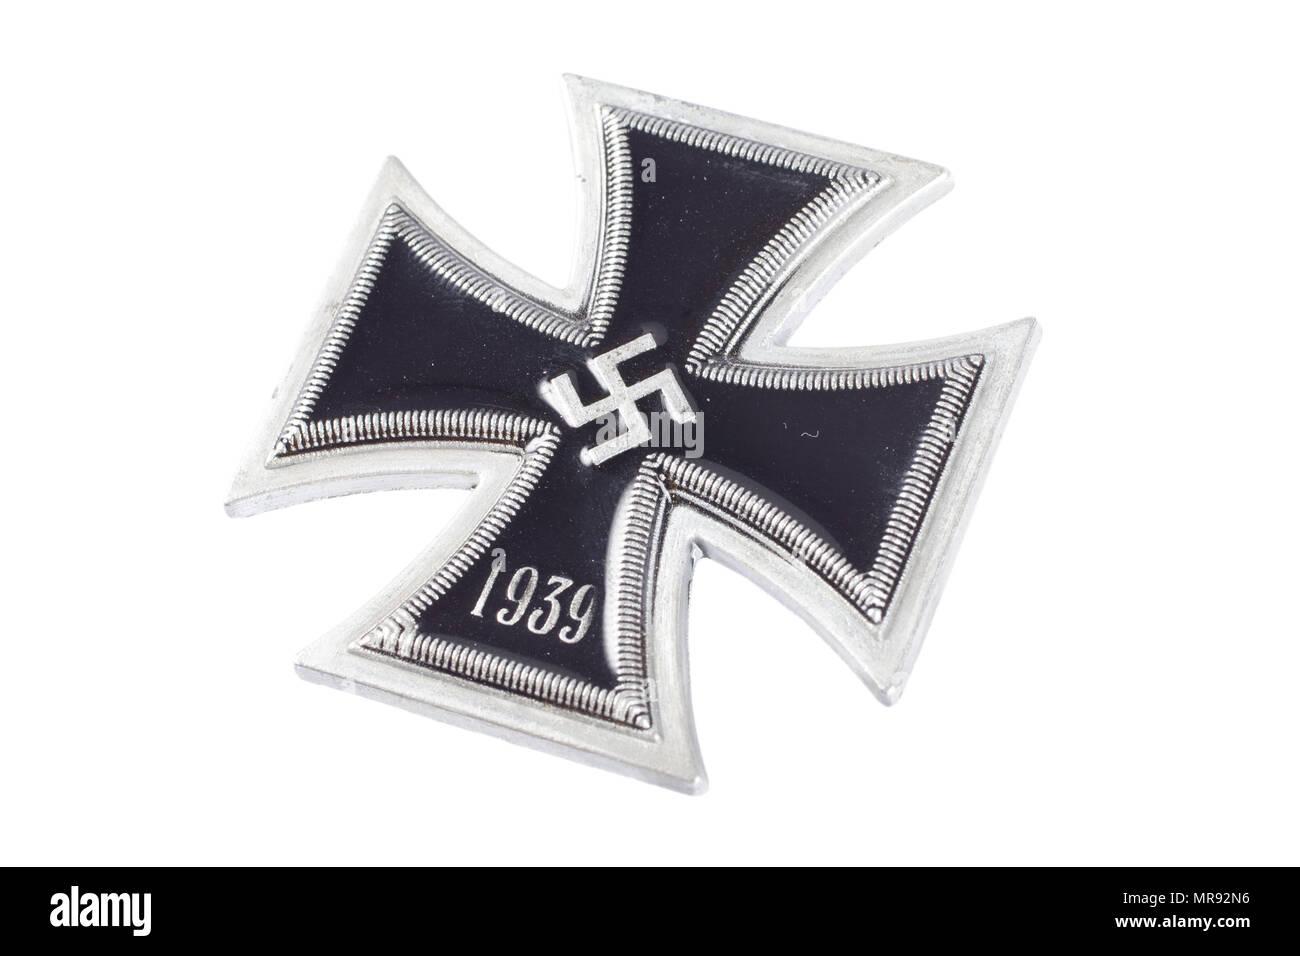 Iron Cross Medal For Bravery Stock Photos Iron Cross Medal For